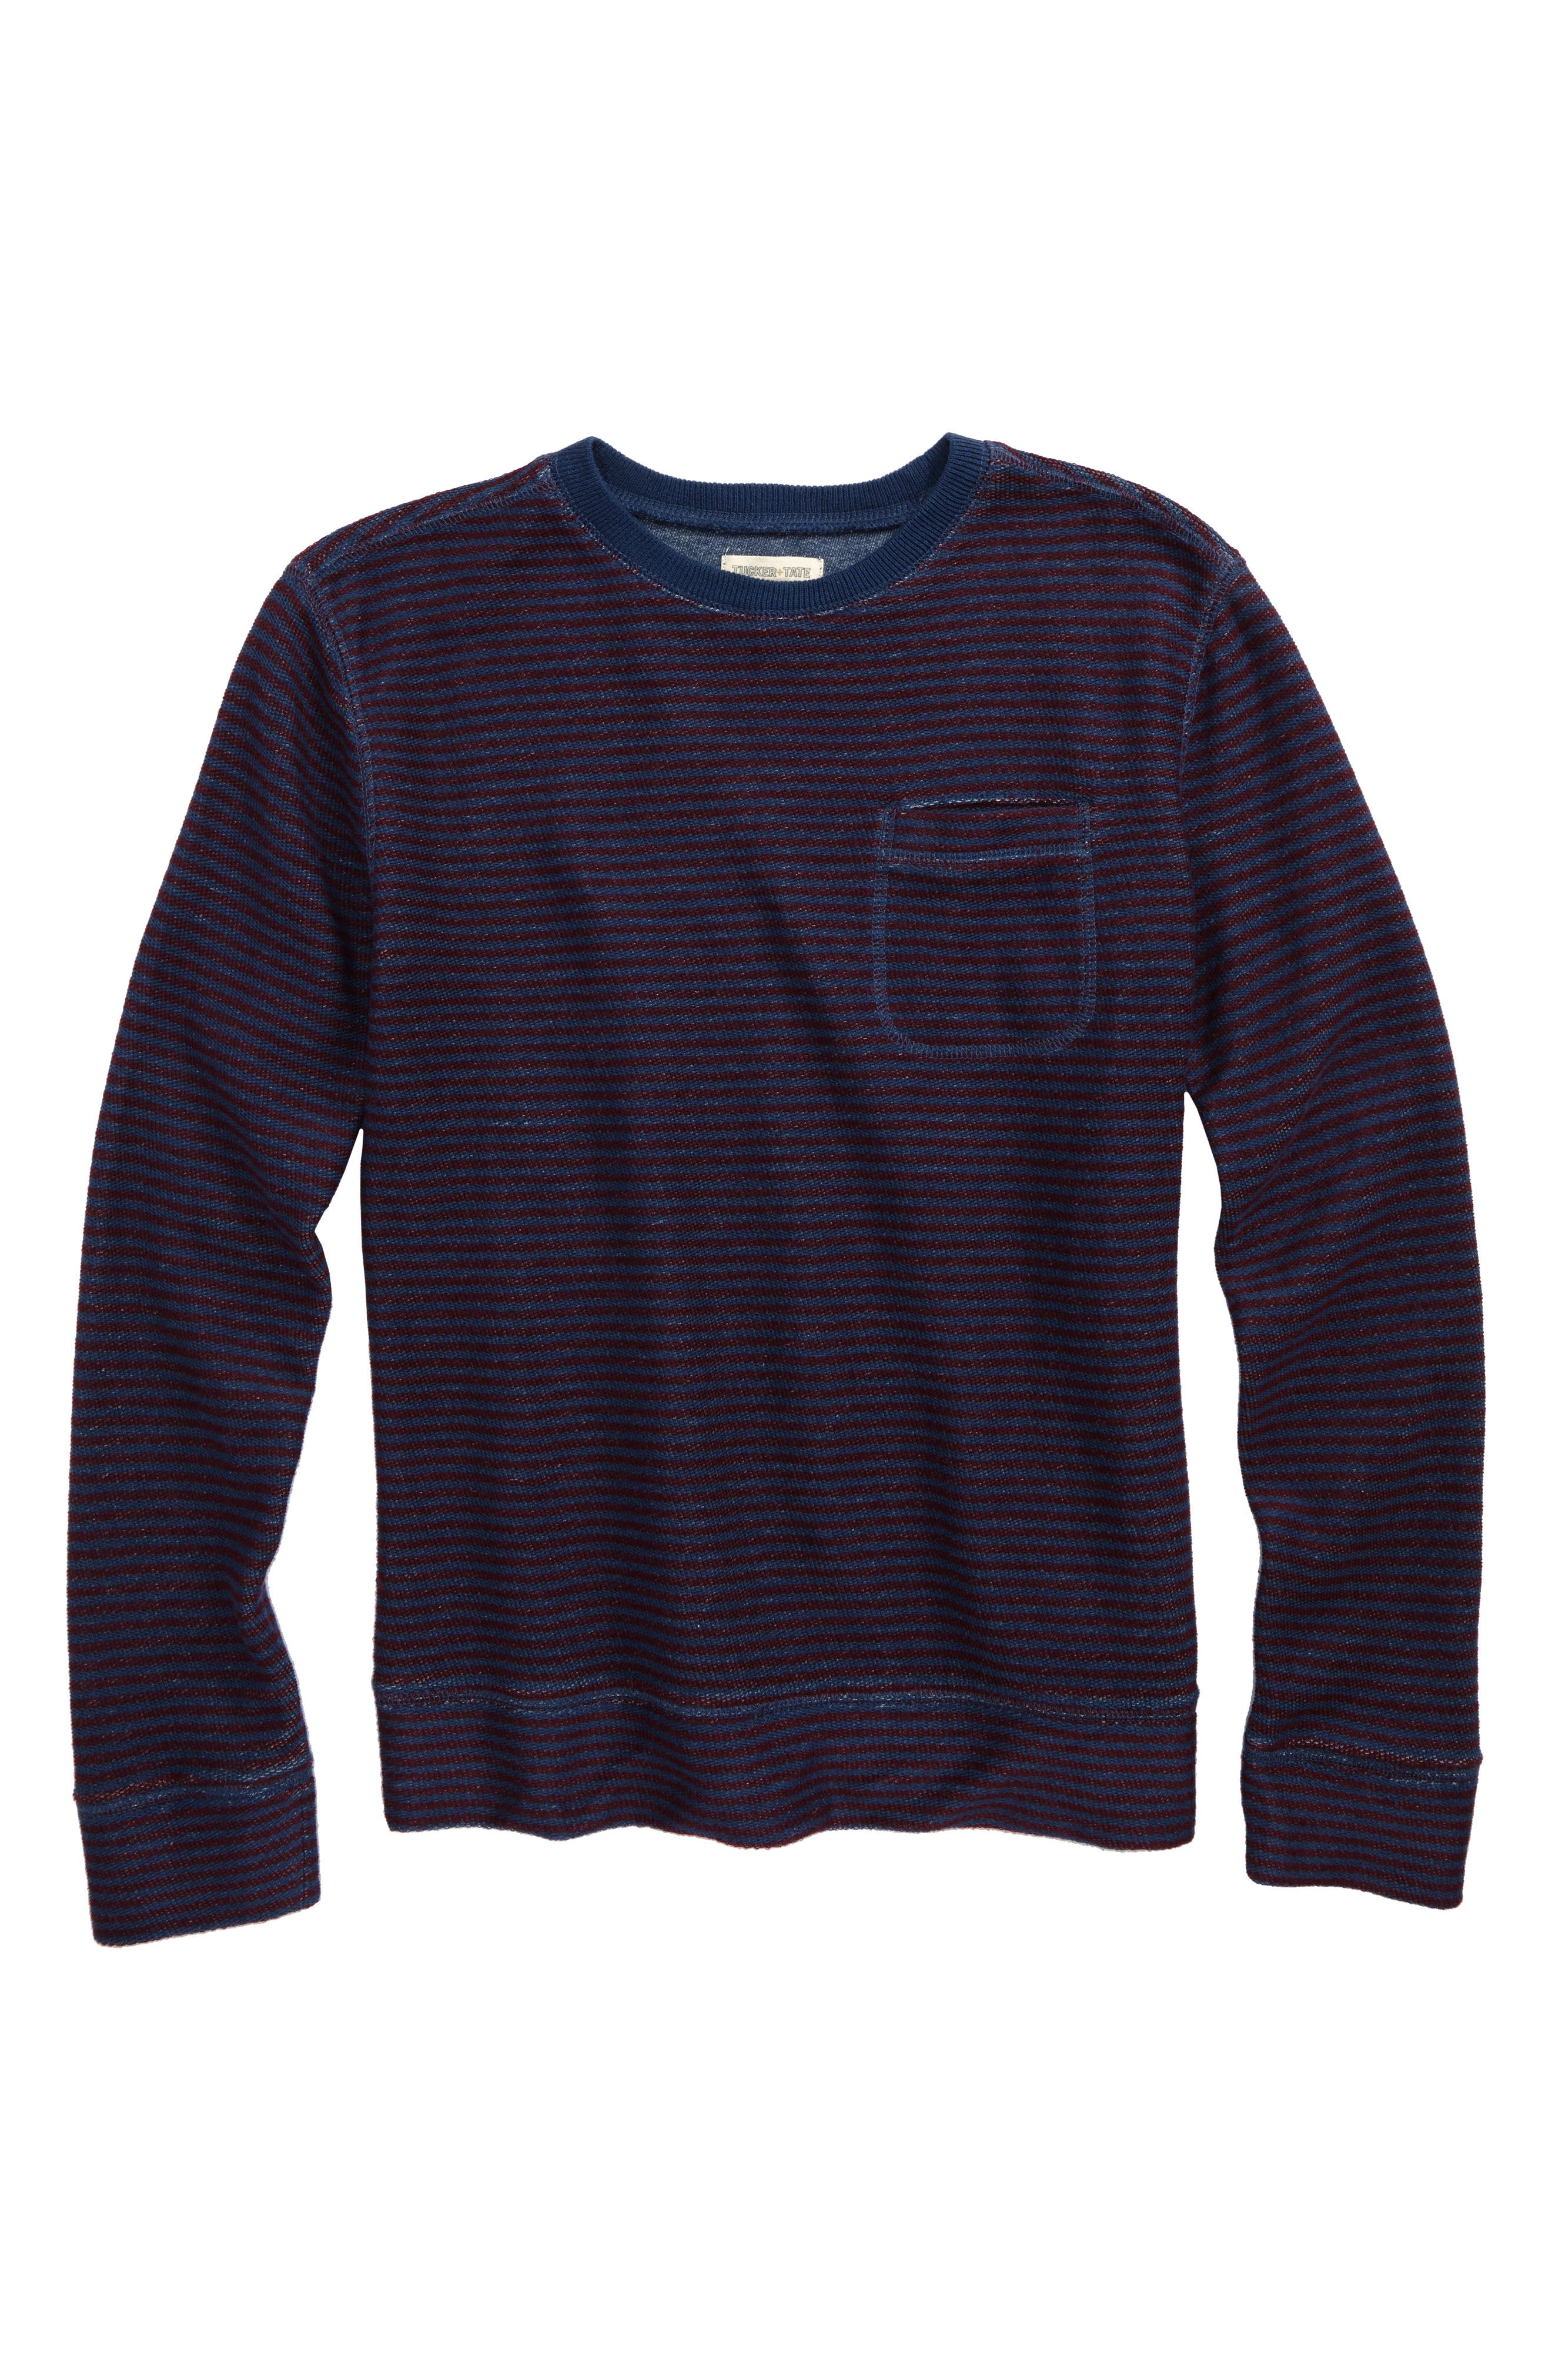 Alternate Image 1 Selected - Tucker + Tate Stripe Crewneck Sweatshirt (Big Boys)